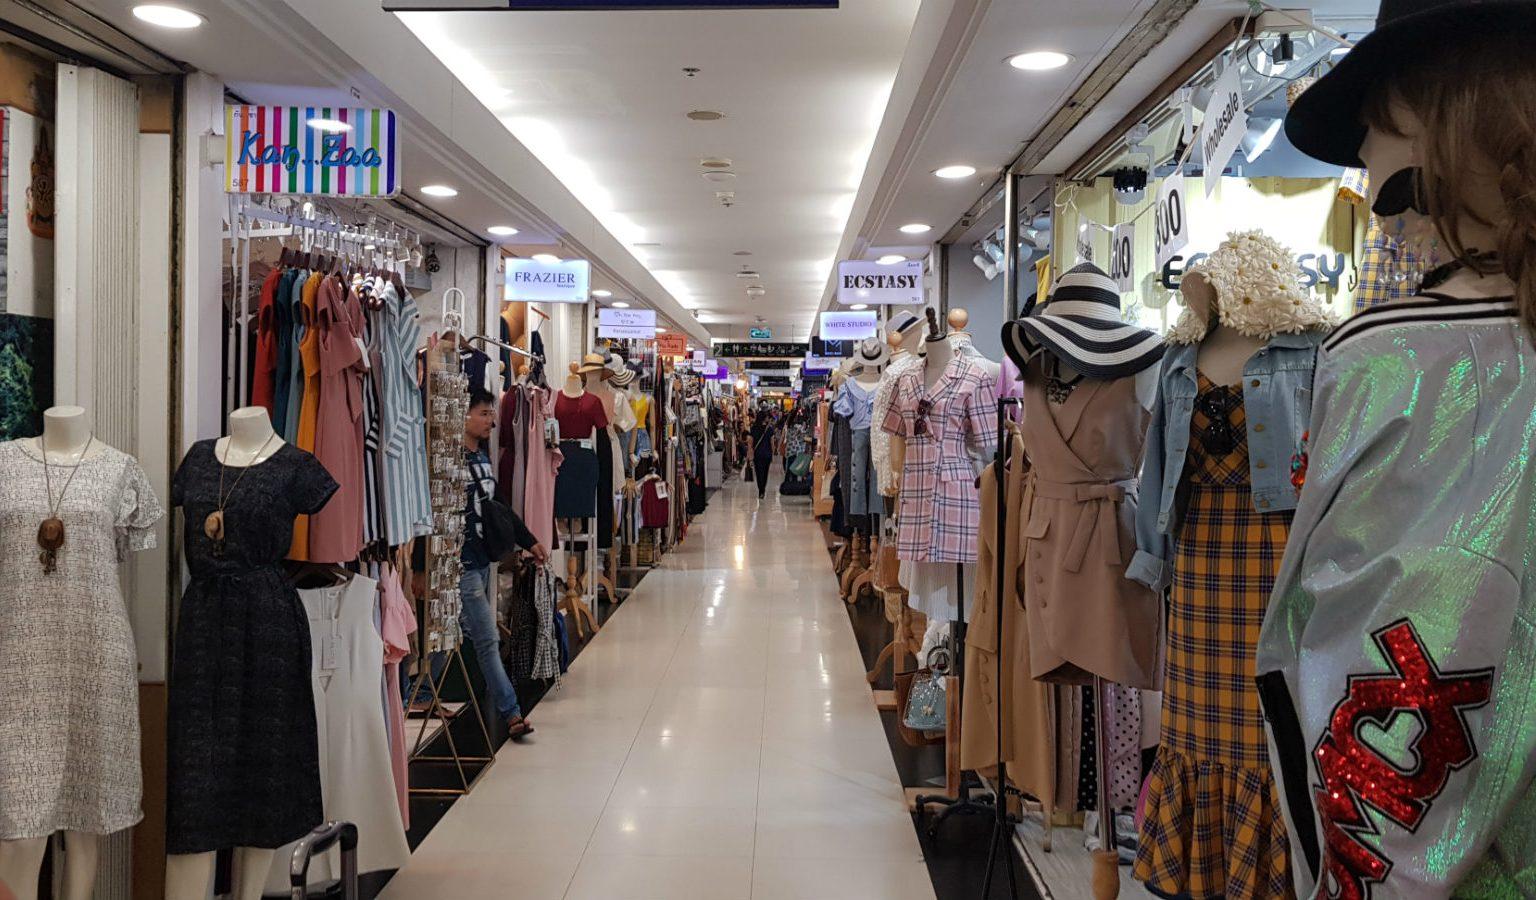 Lange gang in Platinum Fashion mall met aan weerszijde kleine kleding winkeltjes